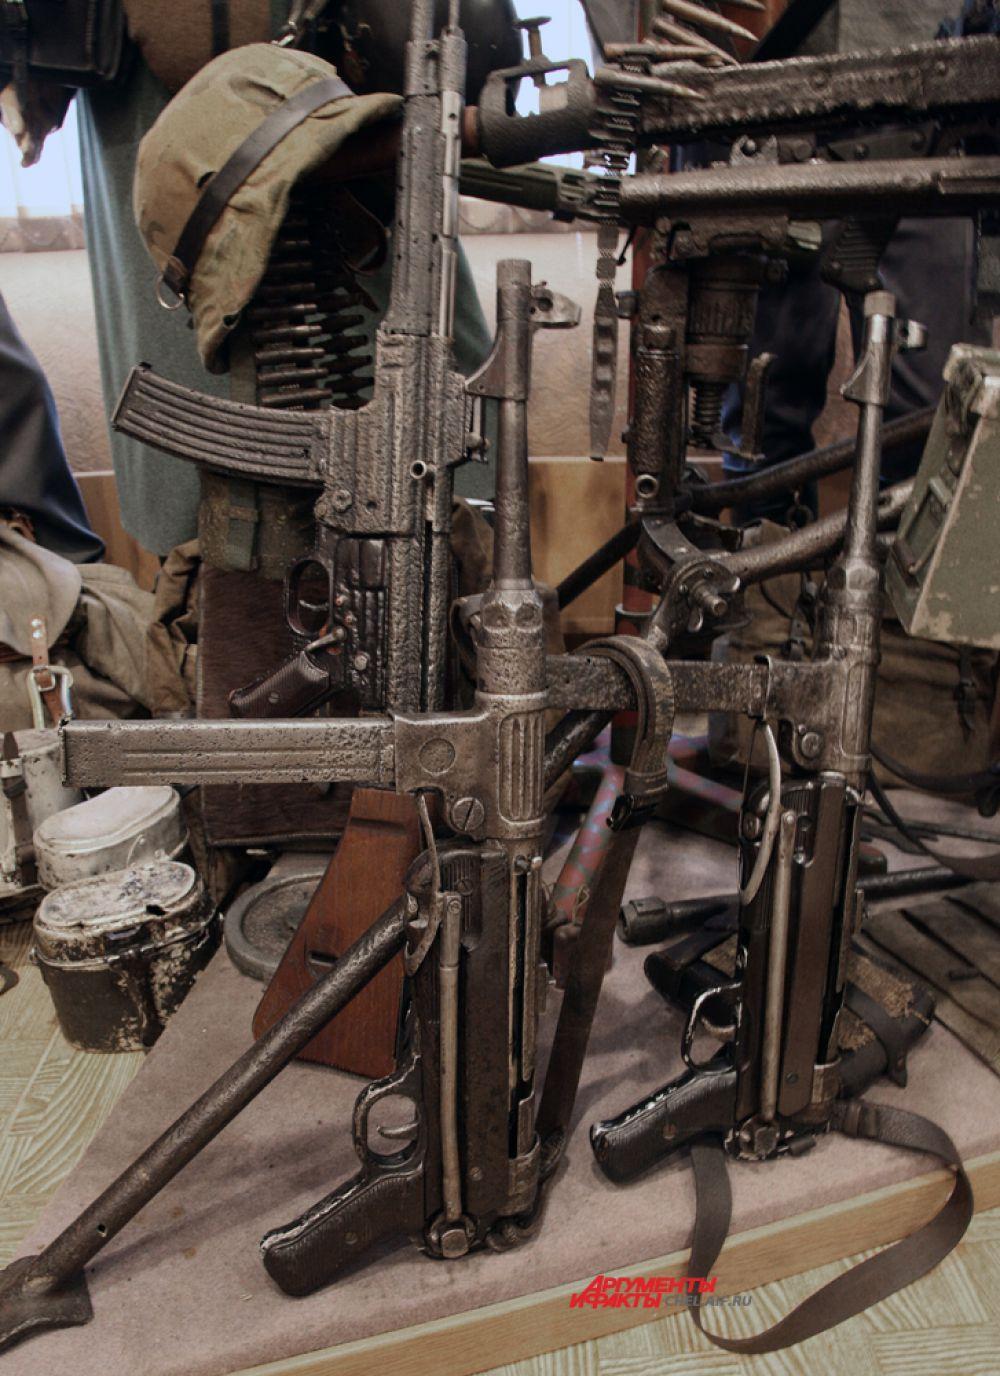 Автоматы вермахта МП-38 и СТГ-43